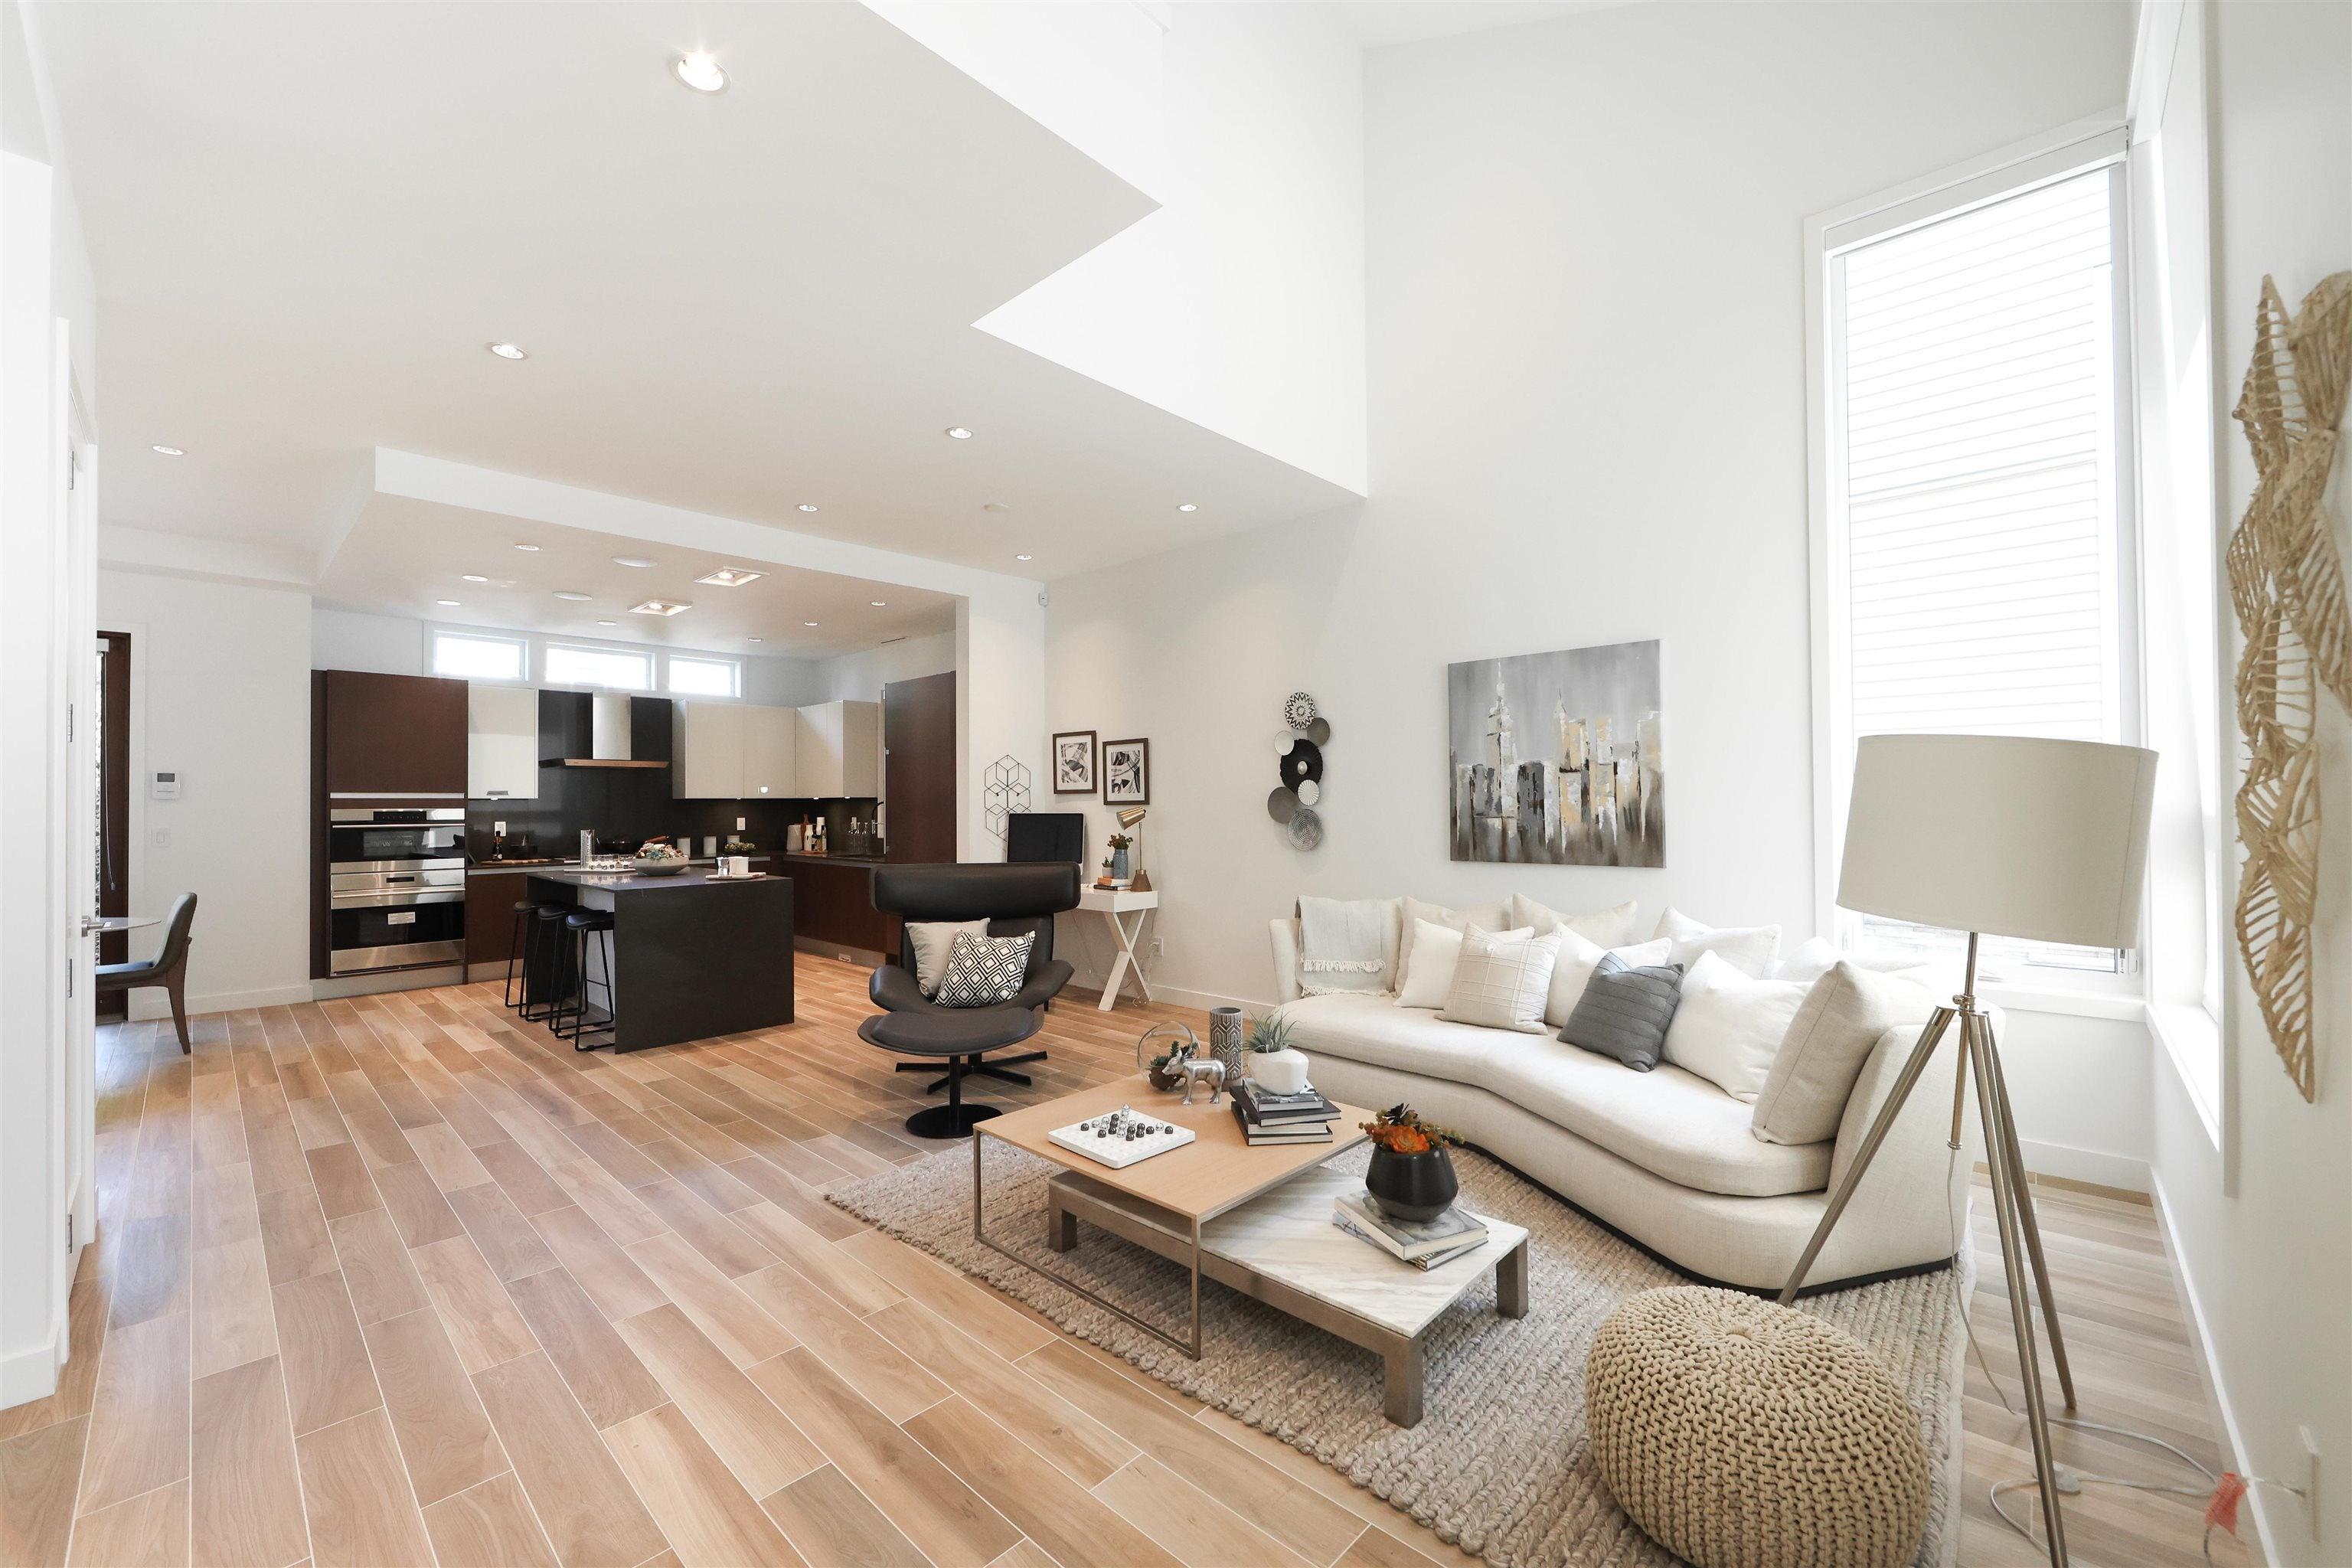 7 9055 DAYTON AVENUE - Garden City House/Single Family for sale, 3 Bedrooms (R2624362)